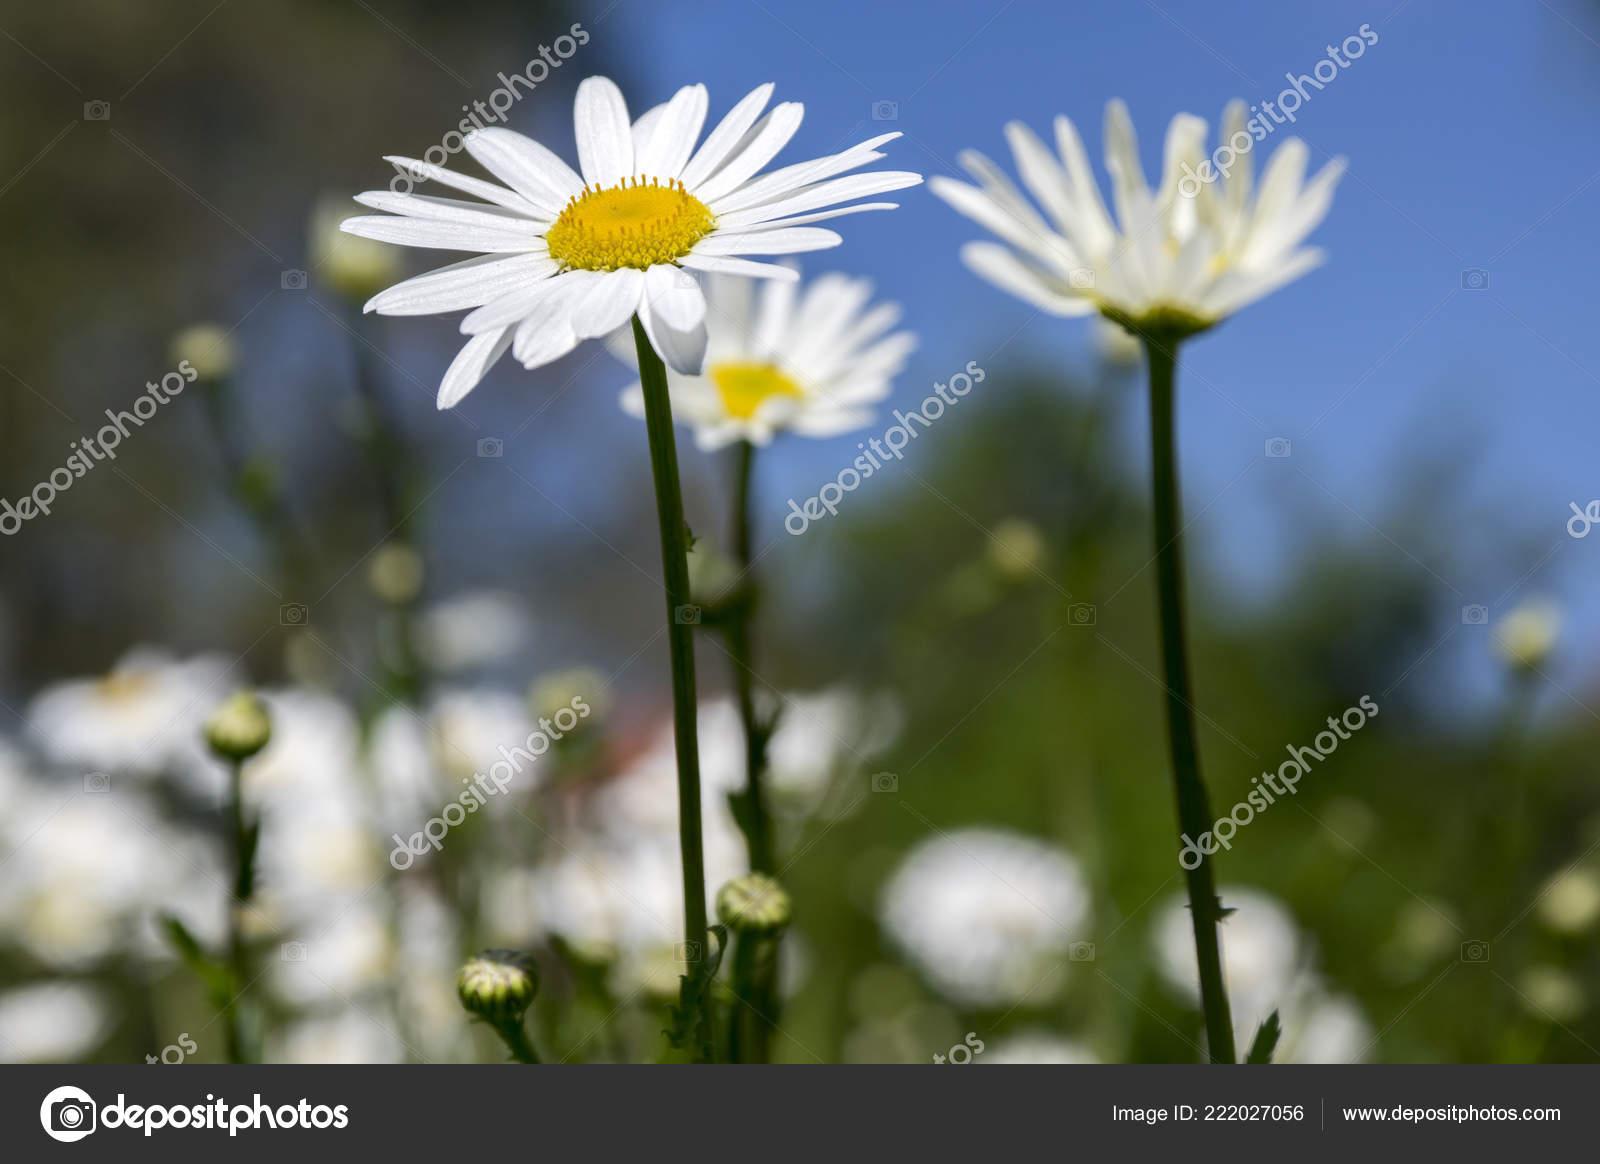 Leucanthemum Vulgare Meadows Wild Flower White Petals Yellow Center